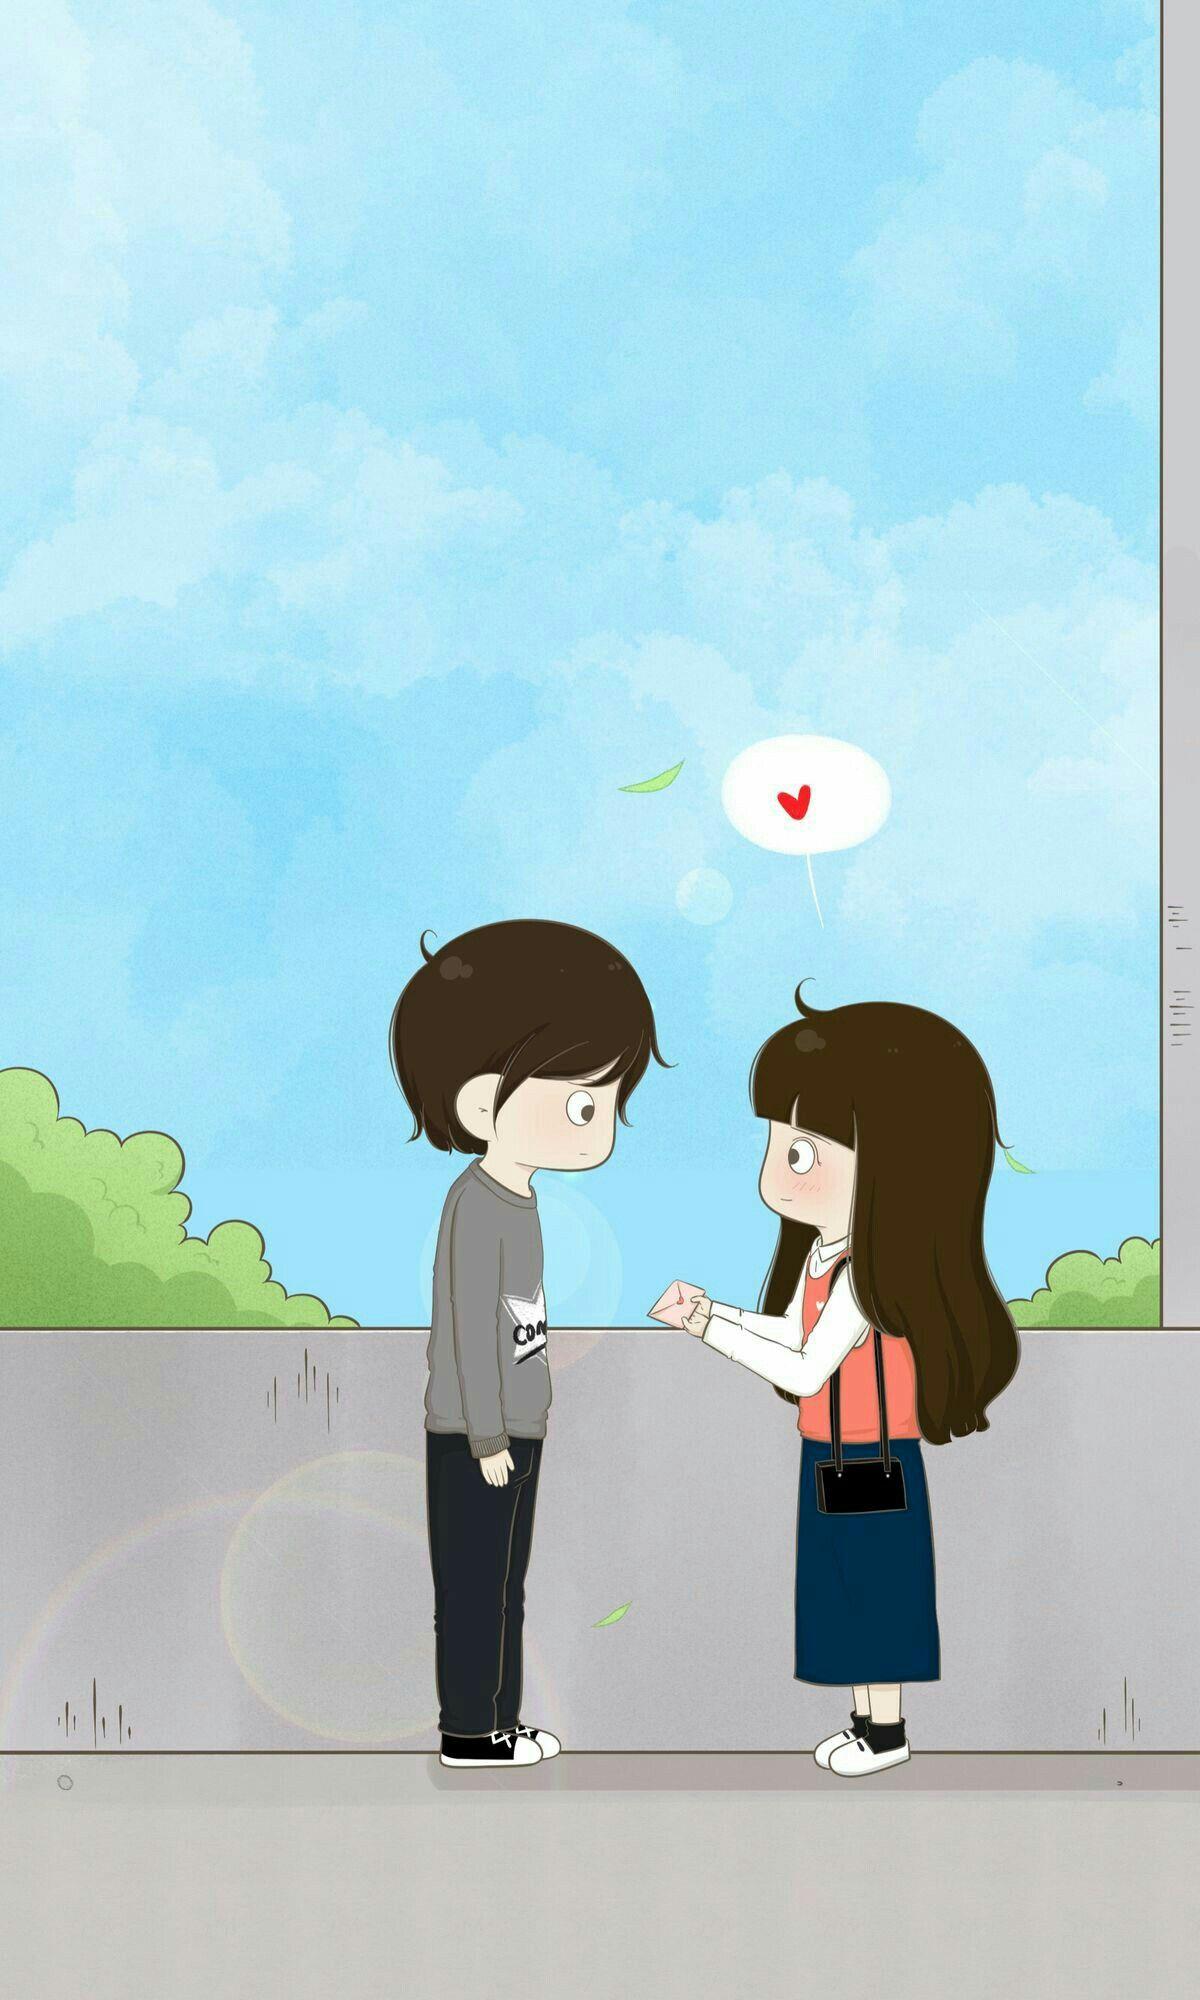 L Oev E Cute Couple Wallpaper Love Cartoon Couple Love Animation Wallpaper